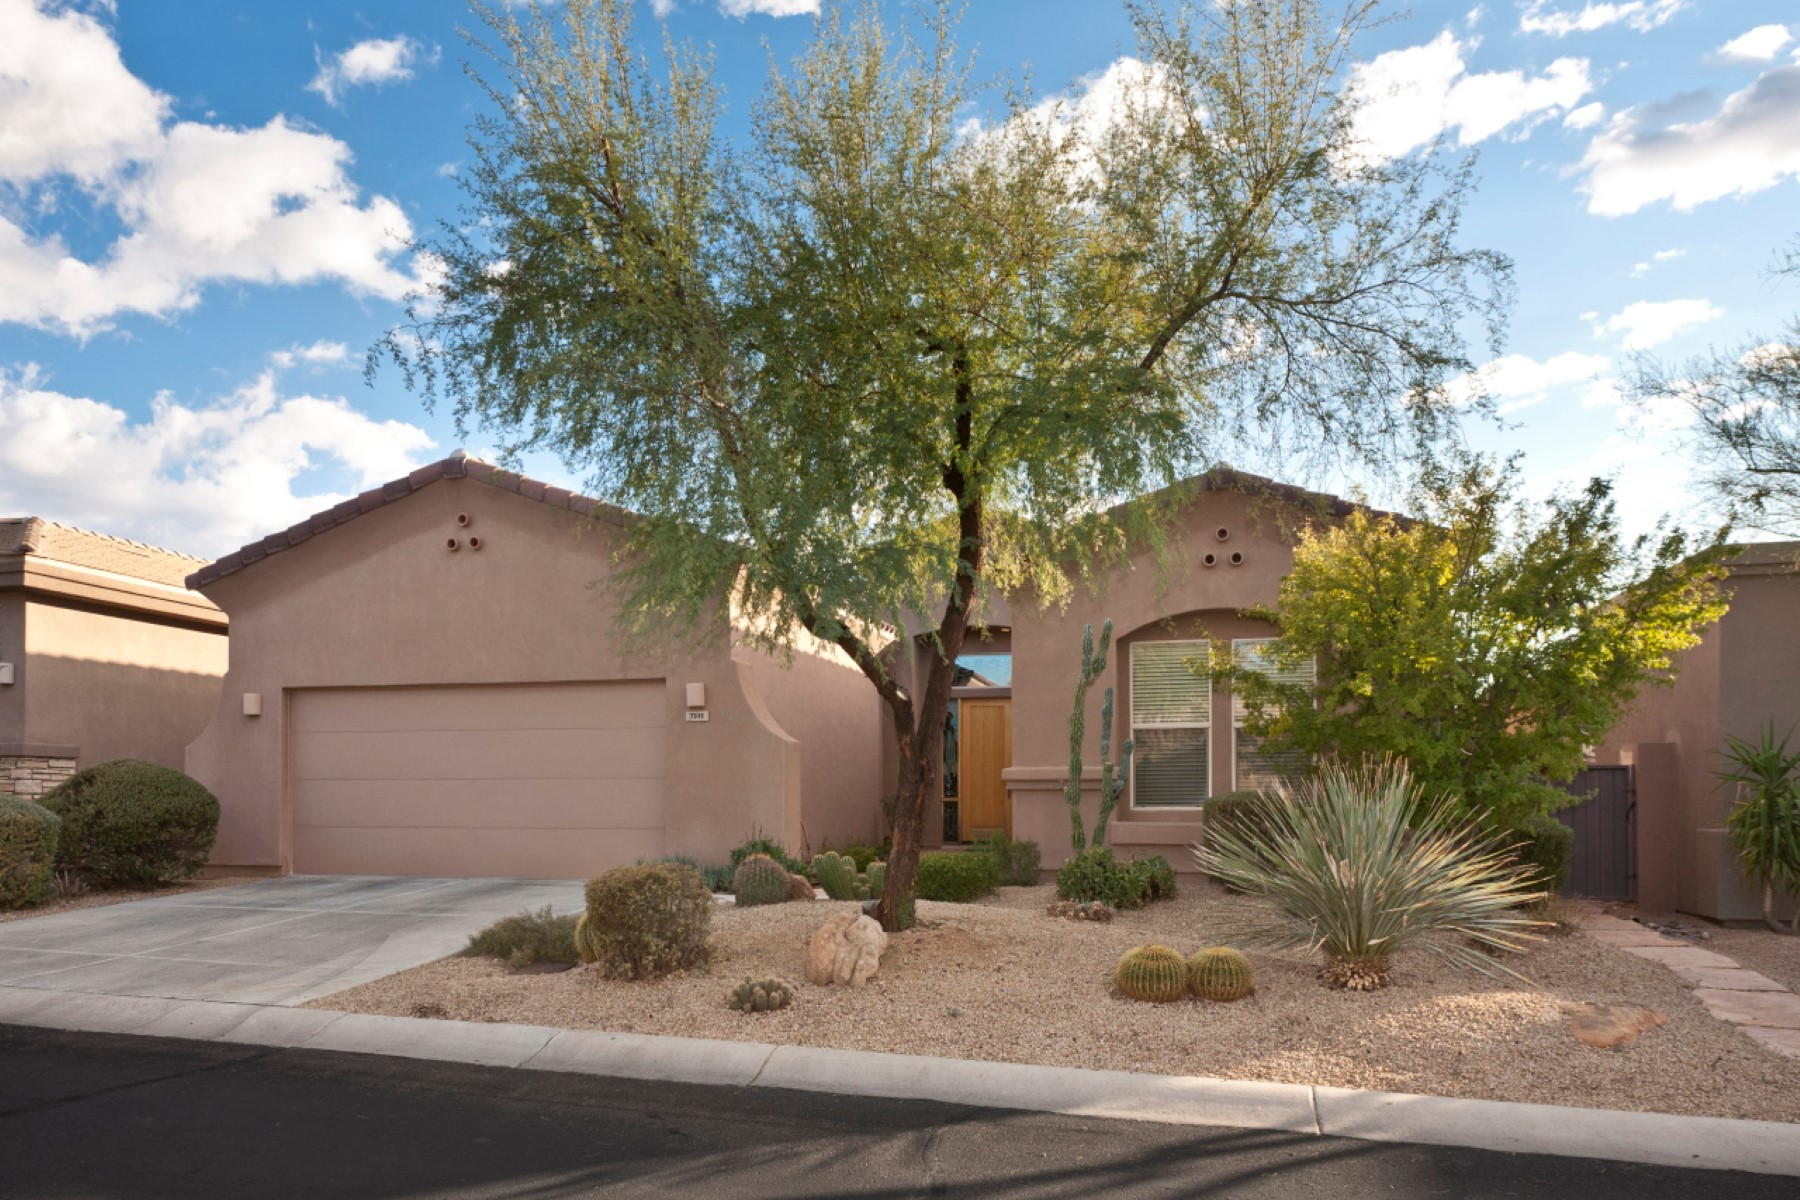 獨棟家庭住宅 為 出售 在 Lovely Winfield home 7315 E Eagle Feather Rd Scottsdale, 亞利桑那州, 85266 美國